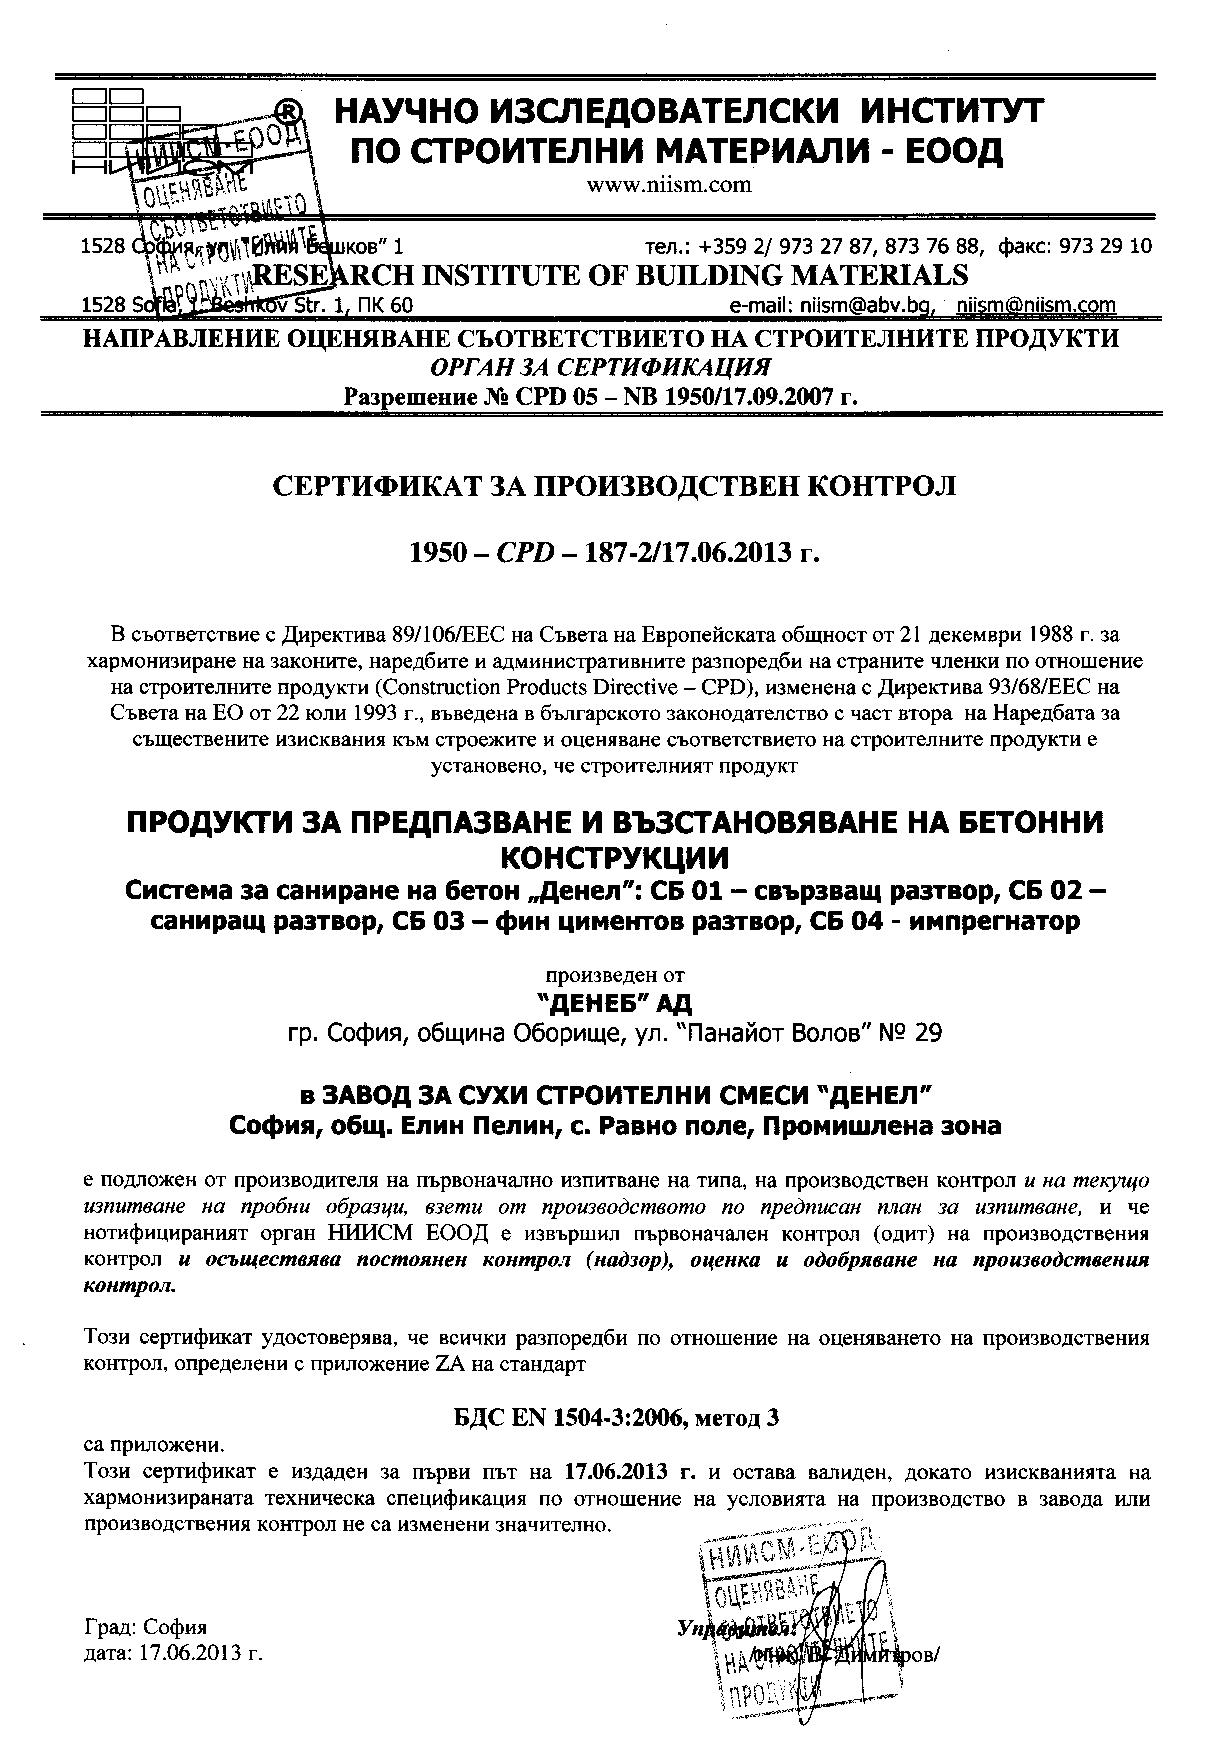 Сертификат за производствен контрол